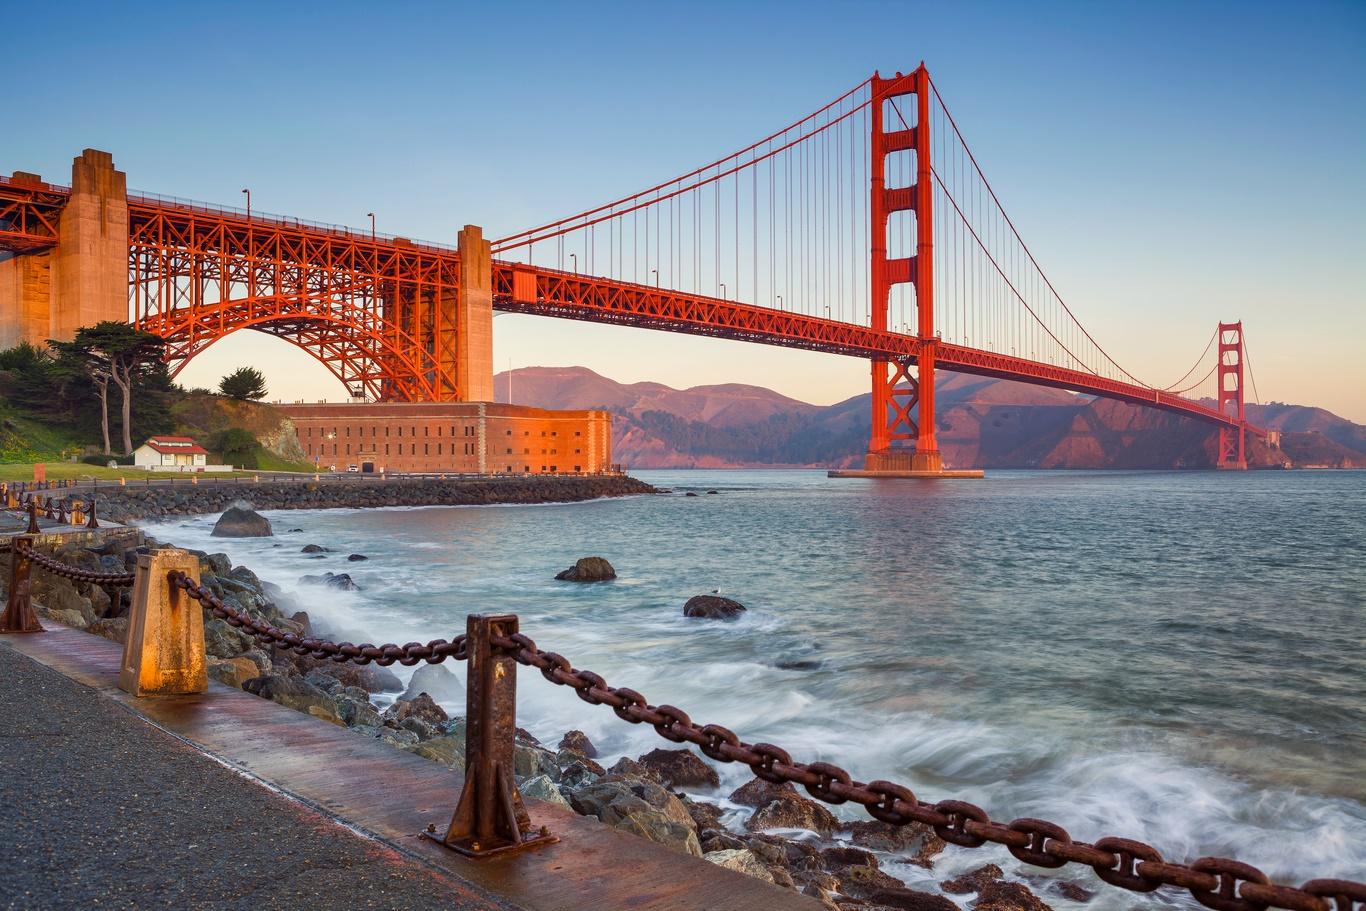 EXCLUSIF OUEST EXT. SAN FRANCISCO - 17J/15N - 1